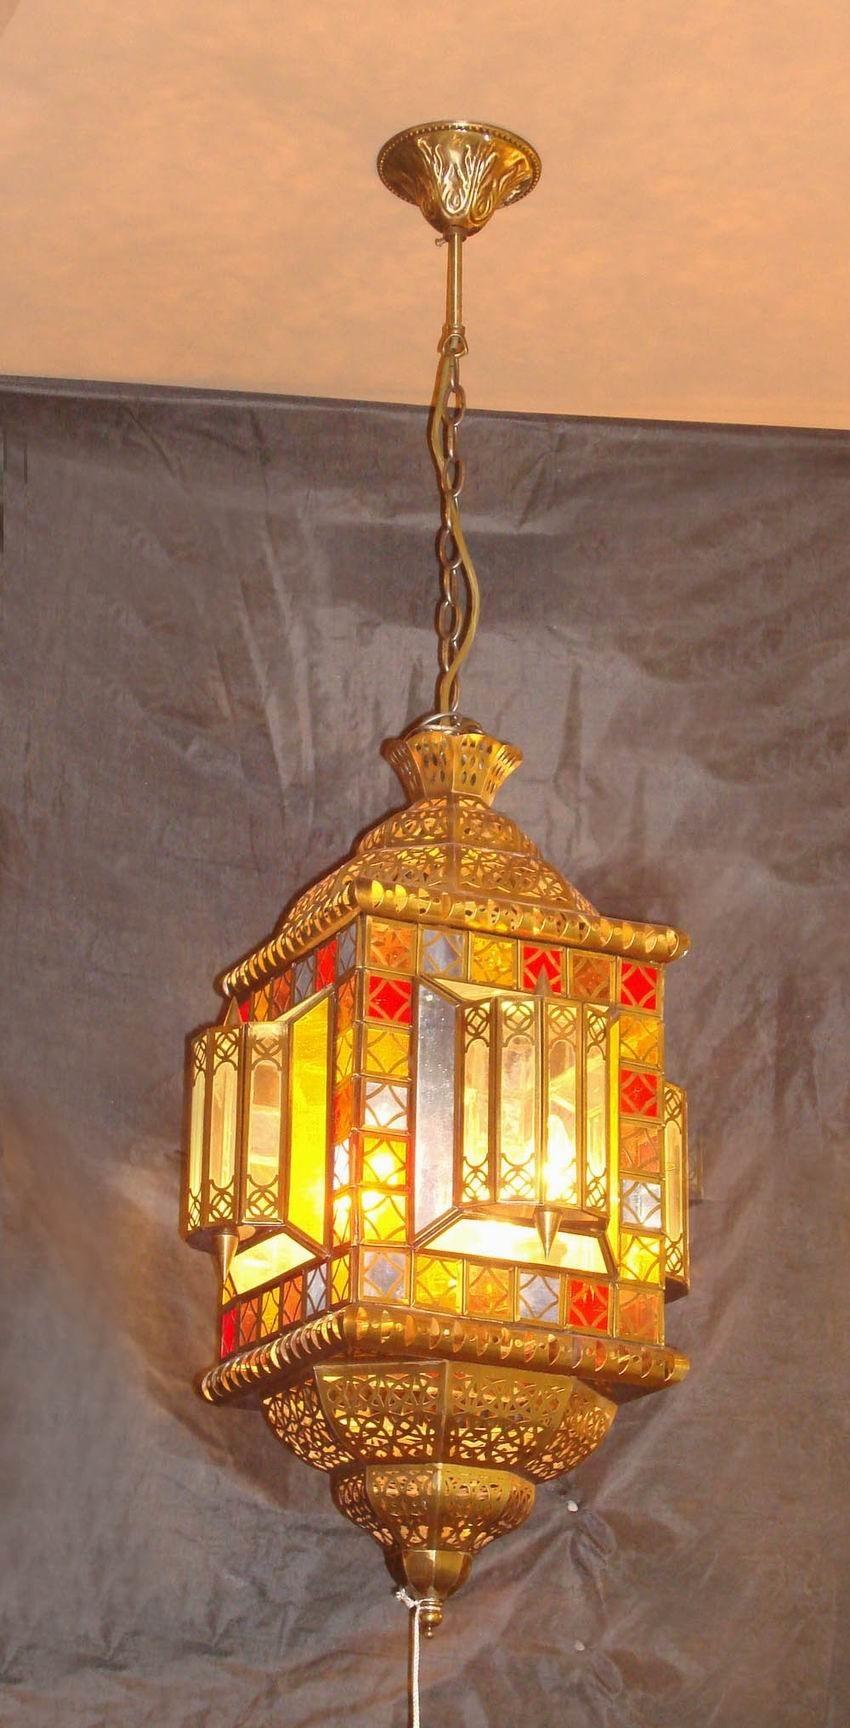 Brass Pendant Lamp with Glass Decorative 18958 Pendant Lighting